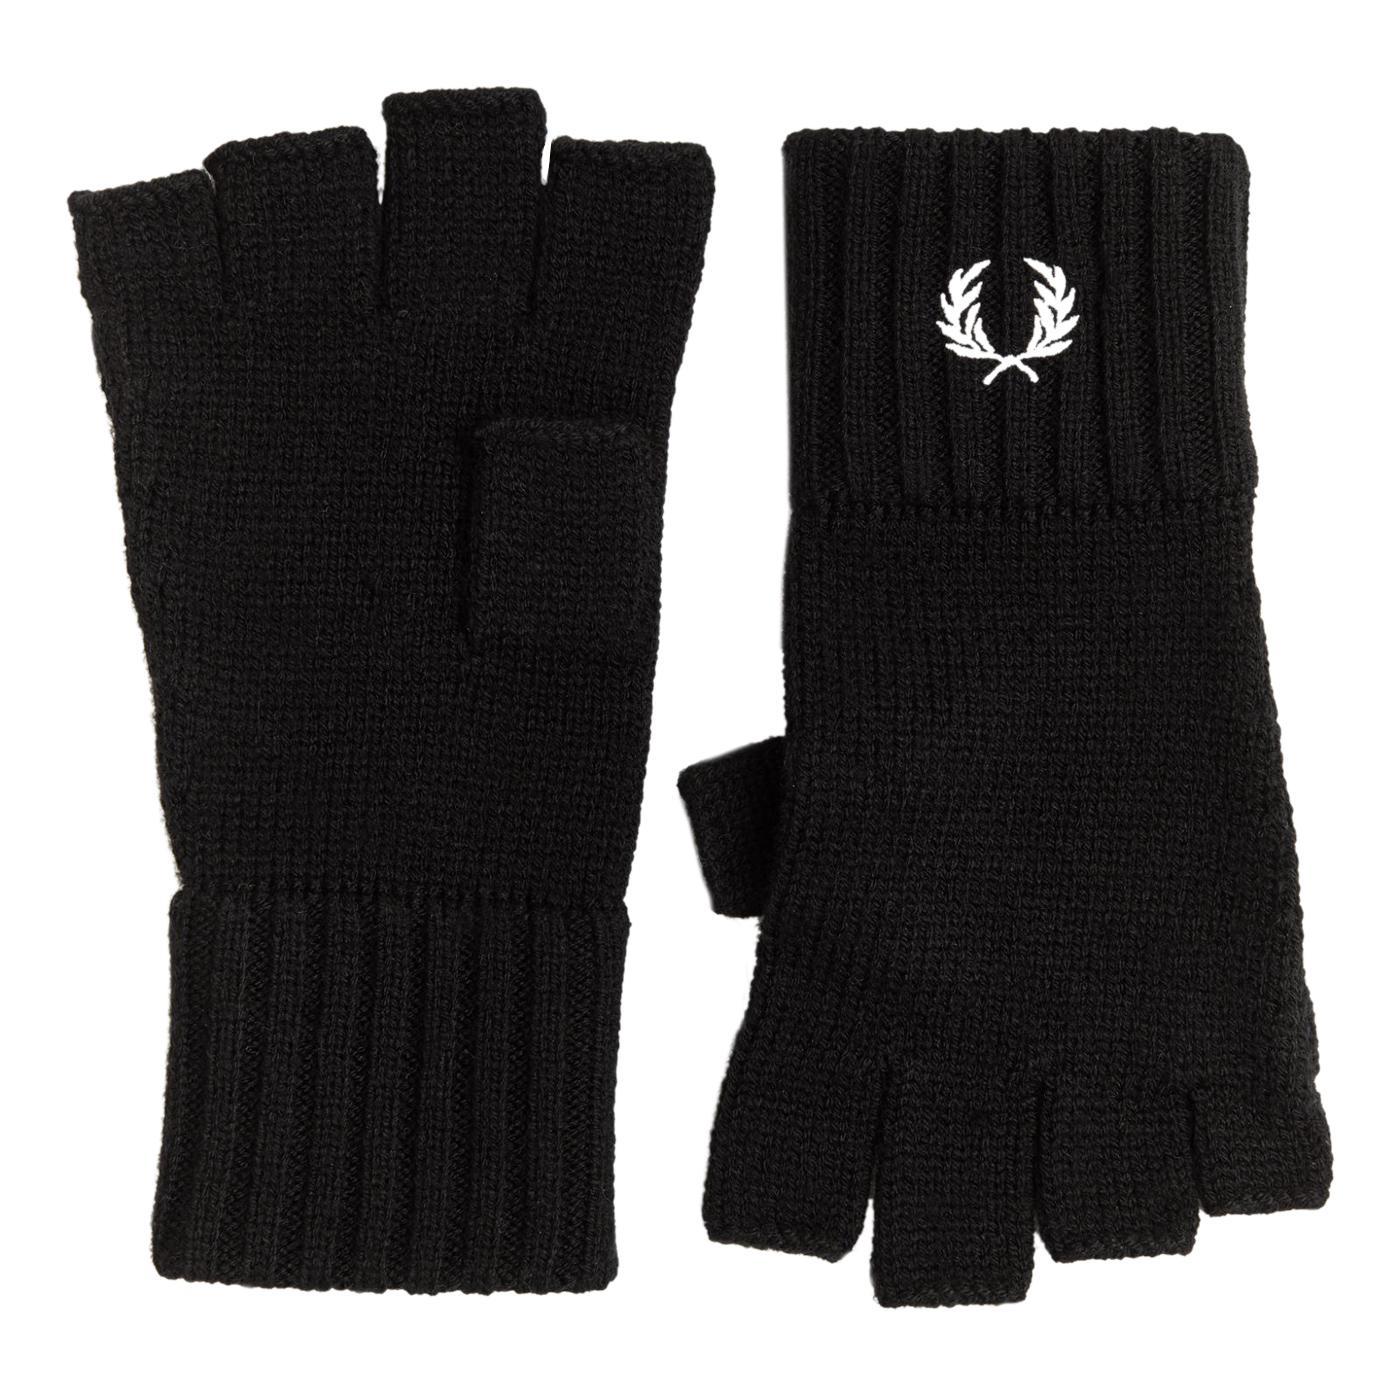 FRED PERRY Retro Wool Fingerless Gloves (Black)